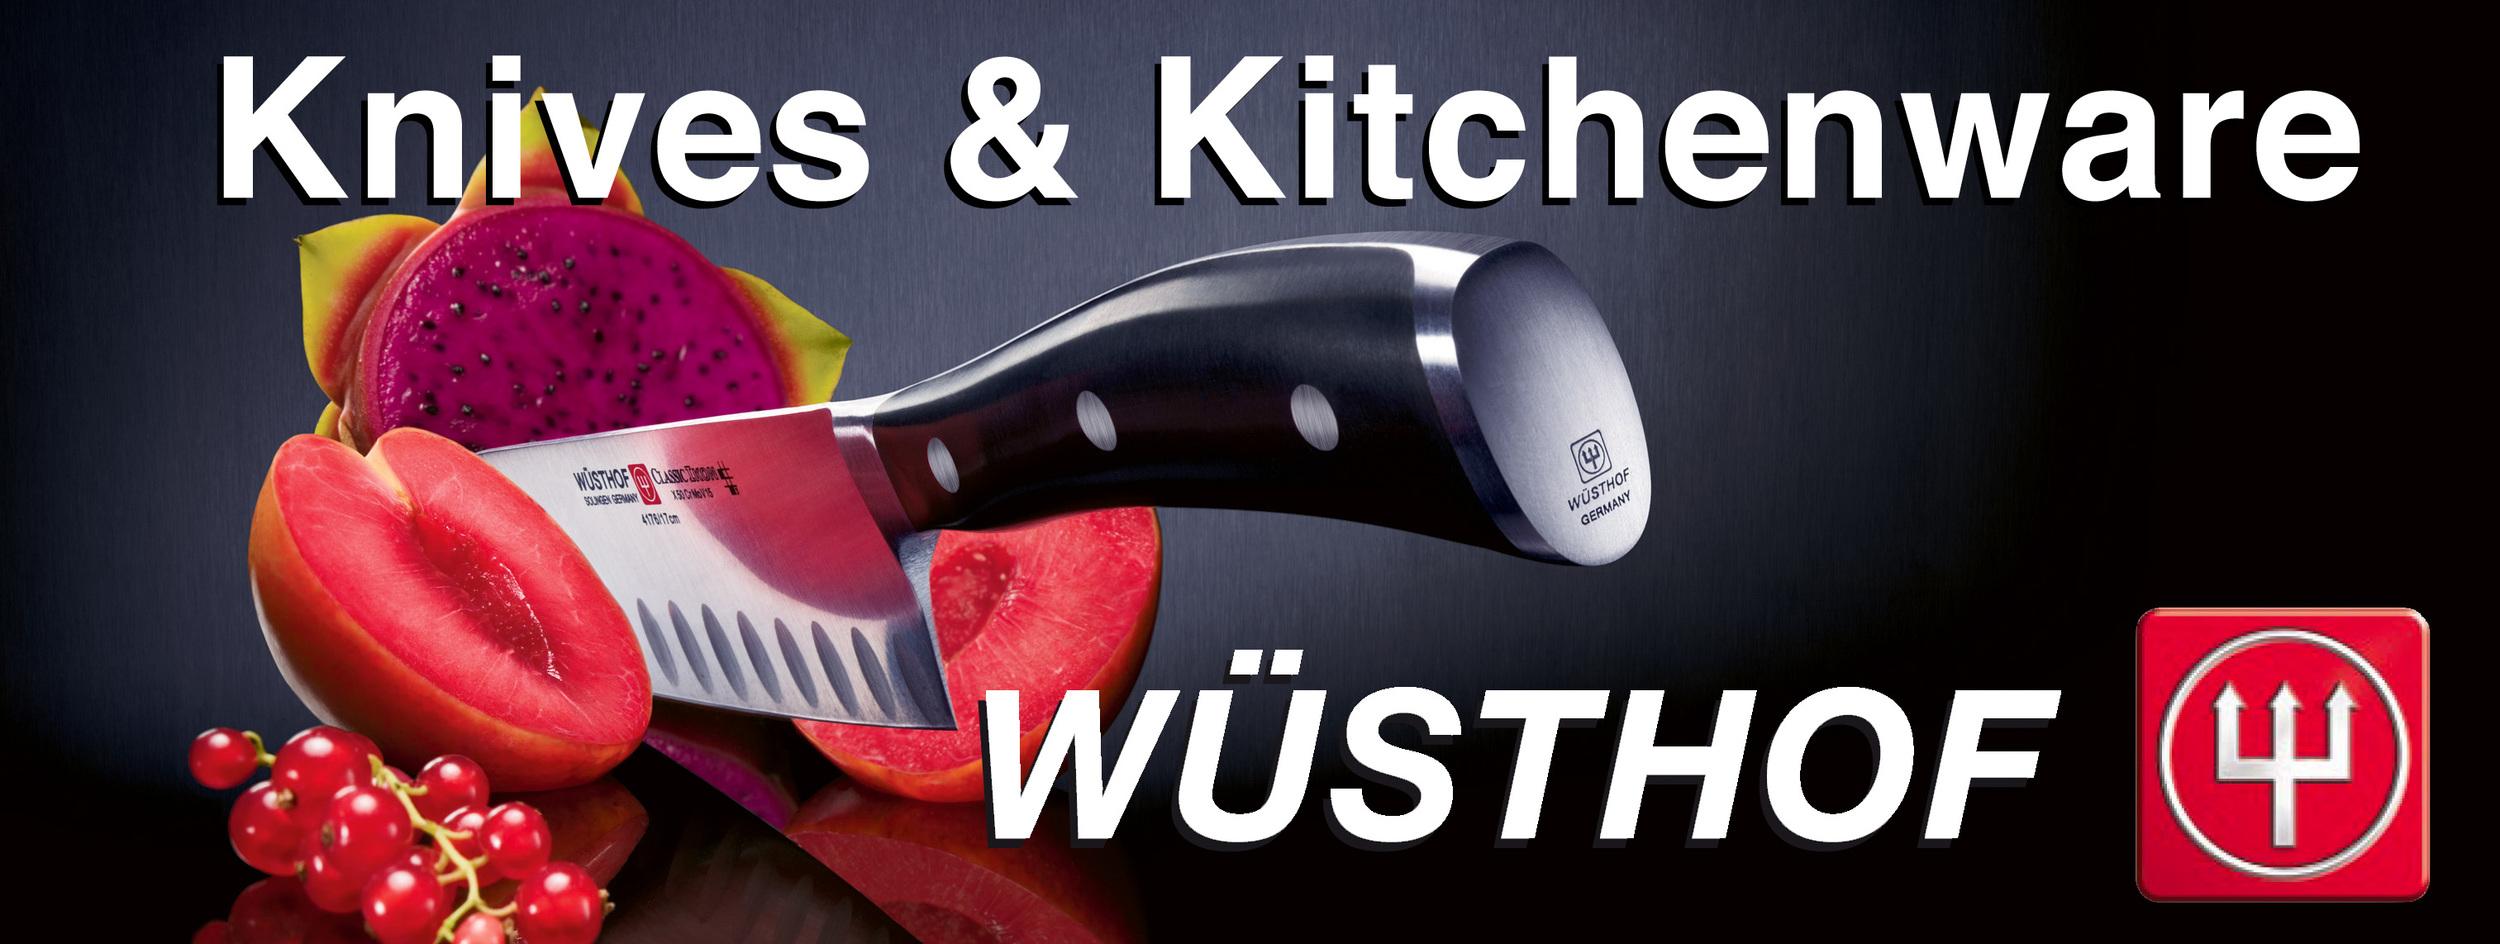 BH-Wusthof Knive Banner.jpg